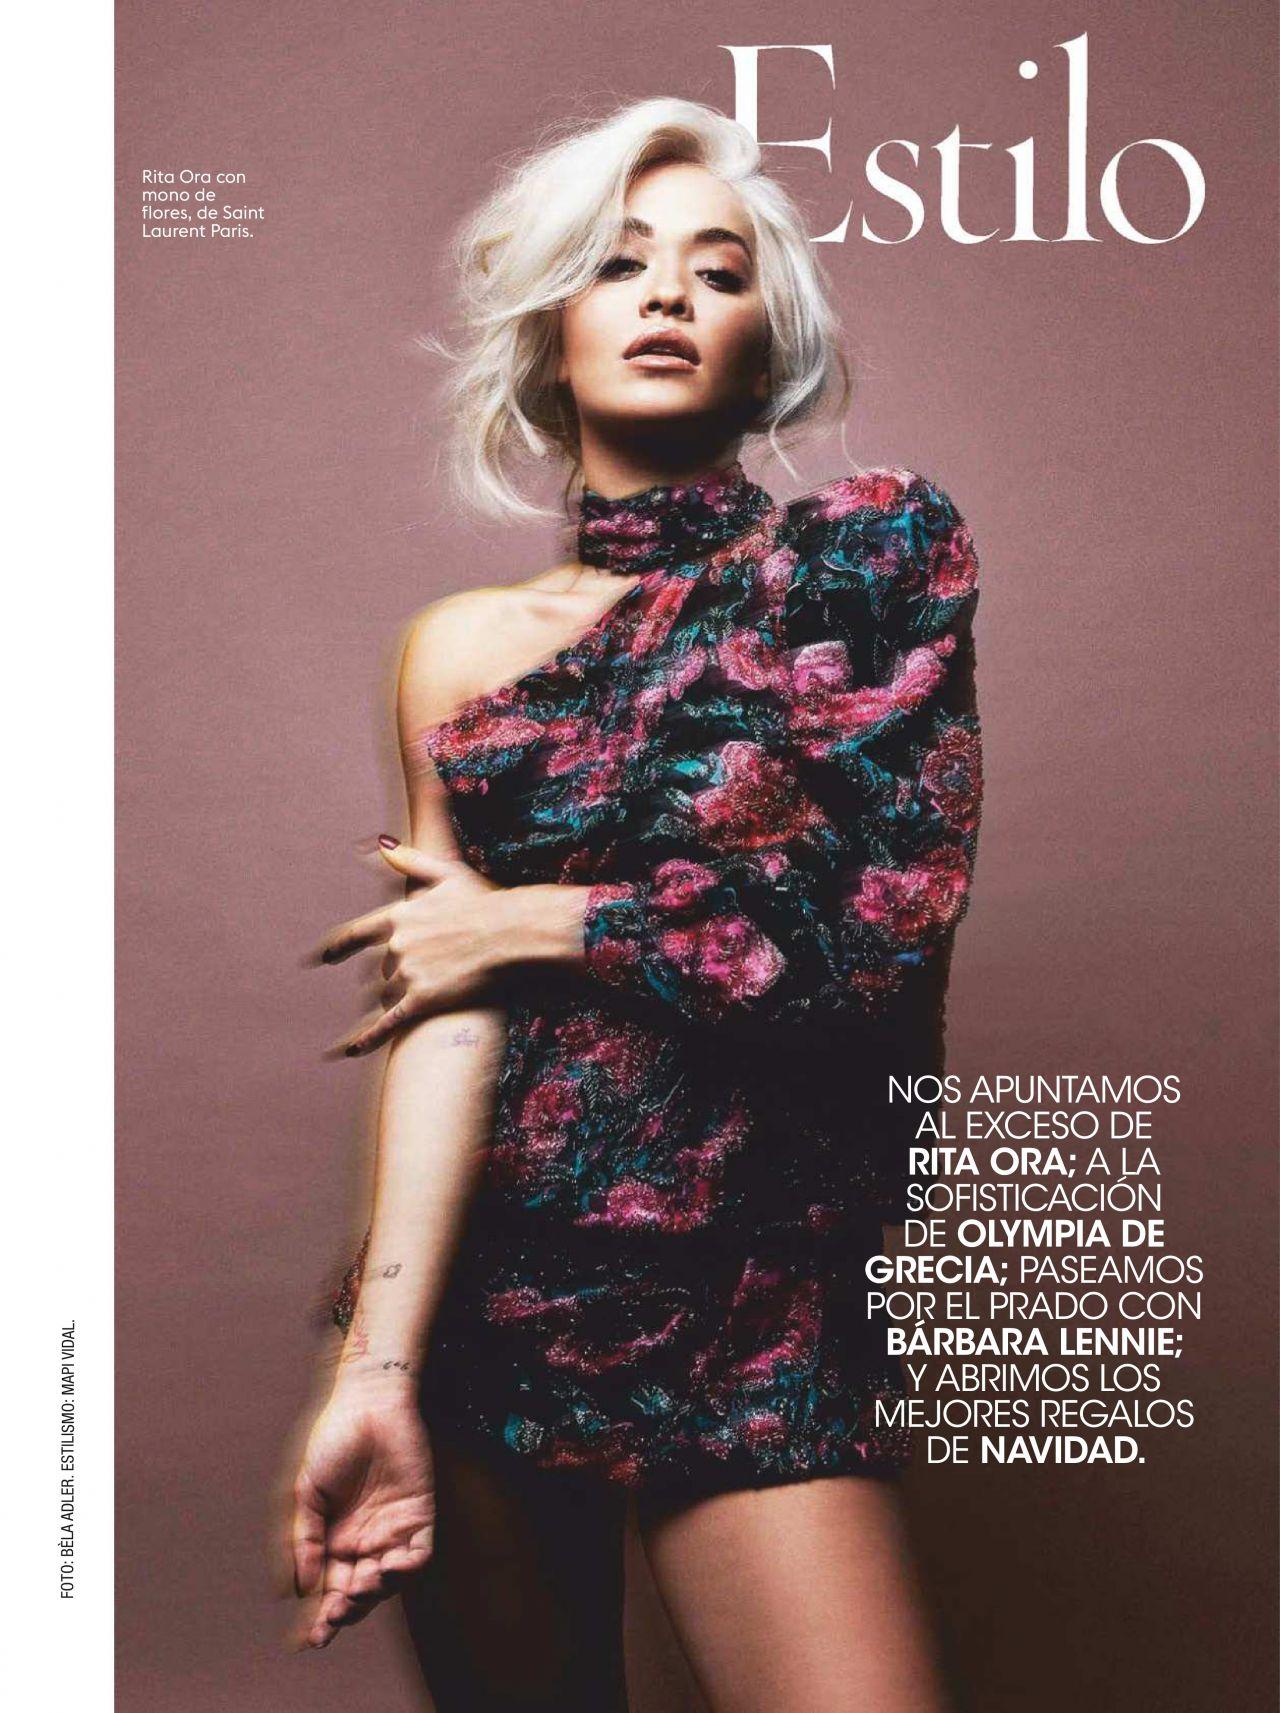 https://celebmafia.com/wp-content/uploads/2018/11/rita-ora-glamour-magazine-spain-11-2018-6.jpg